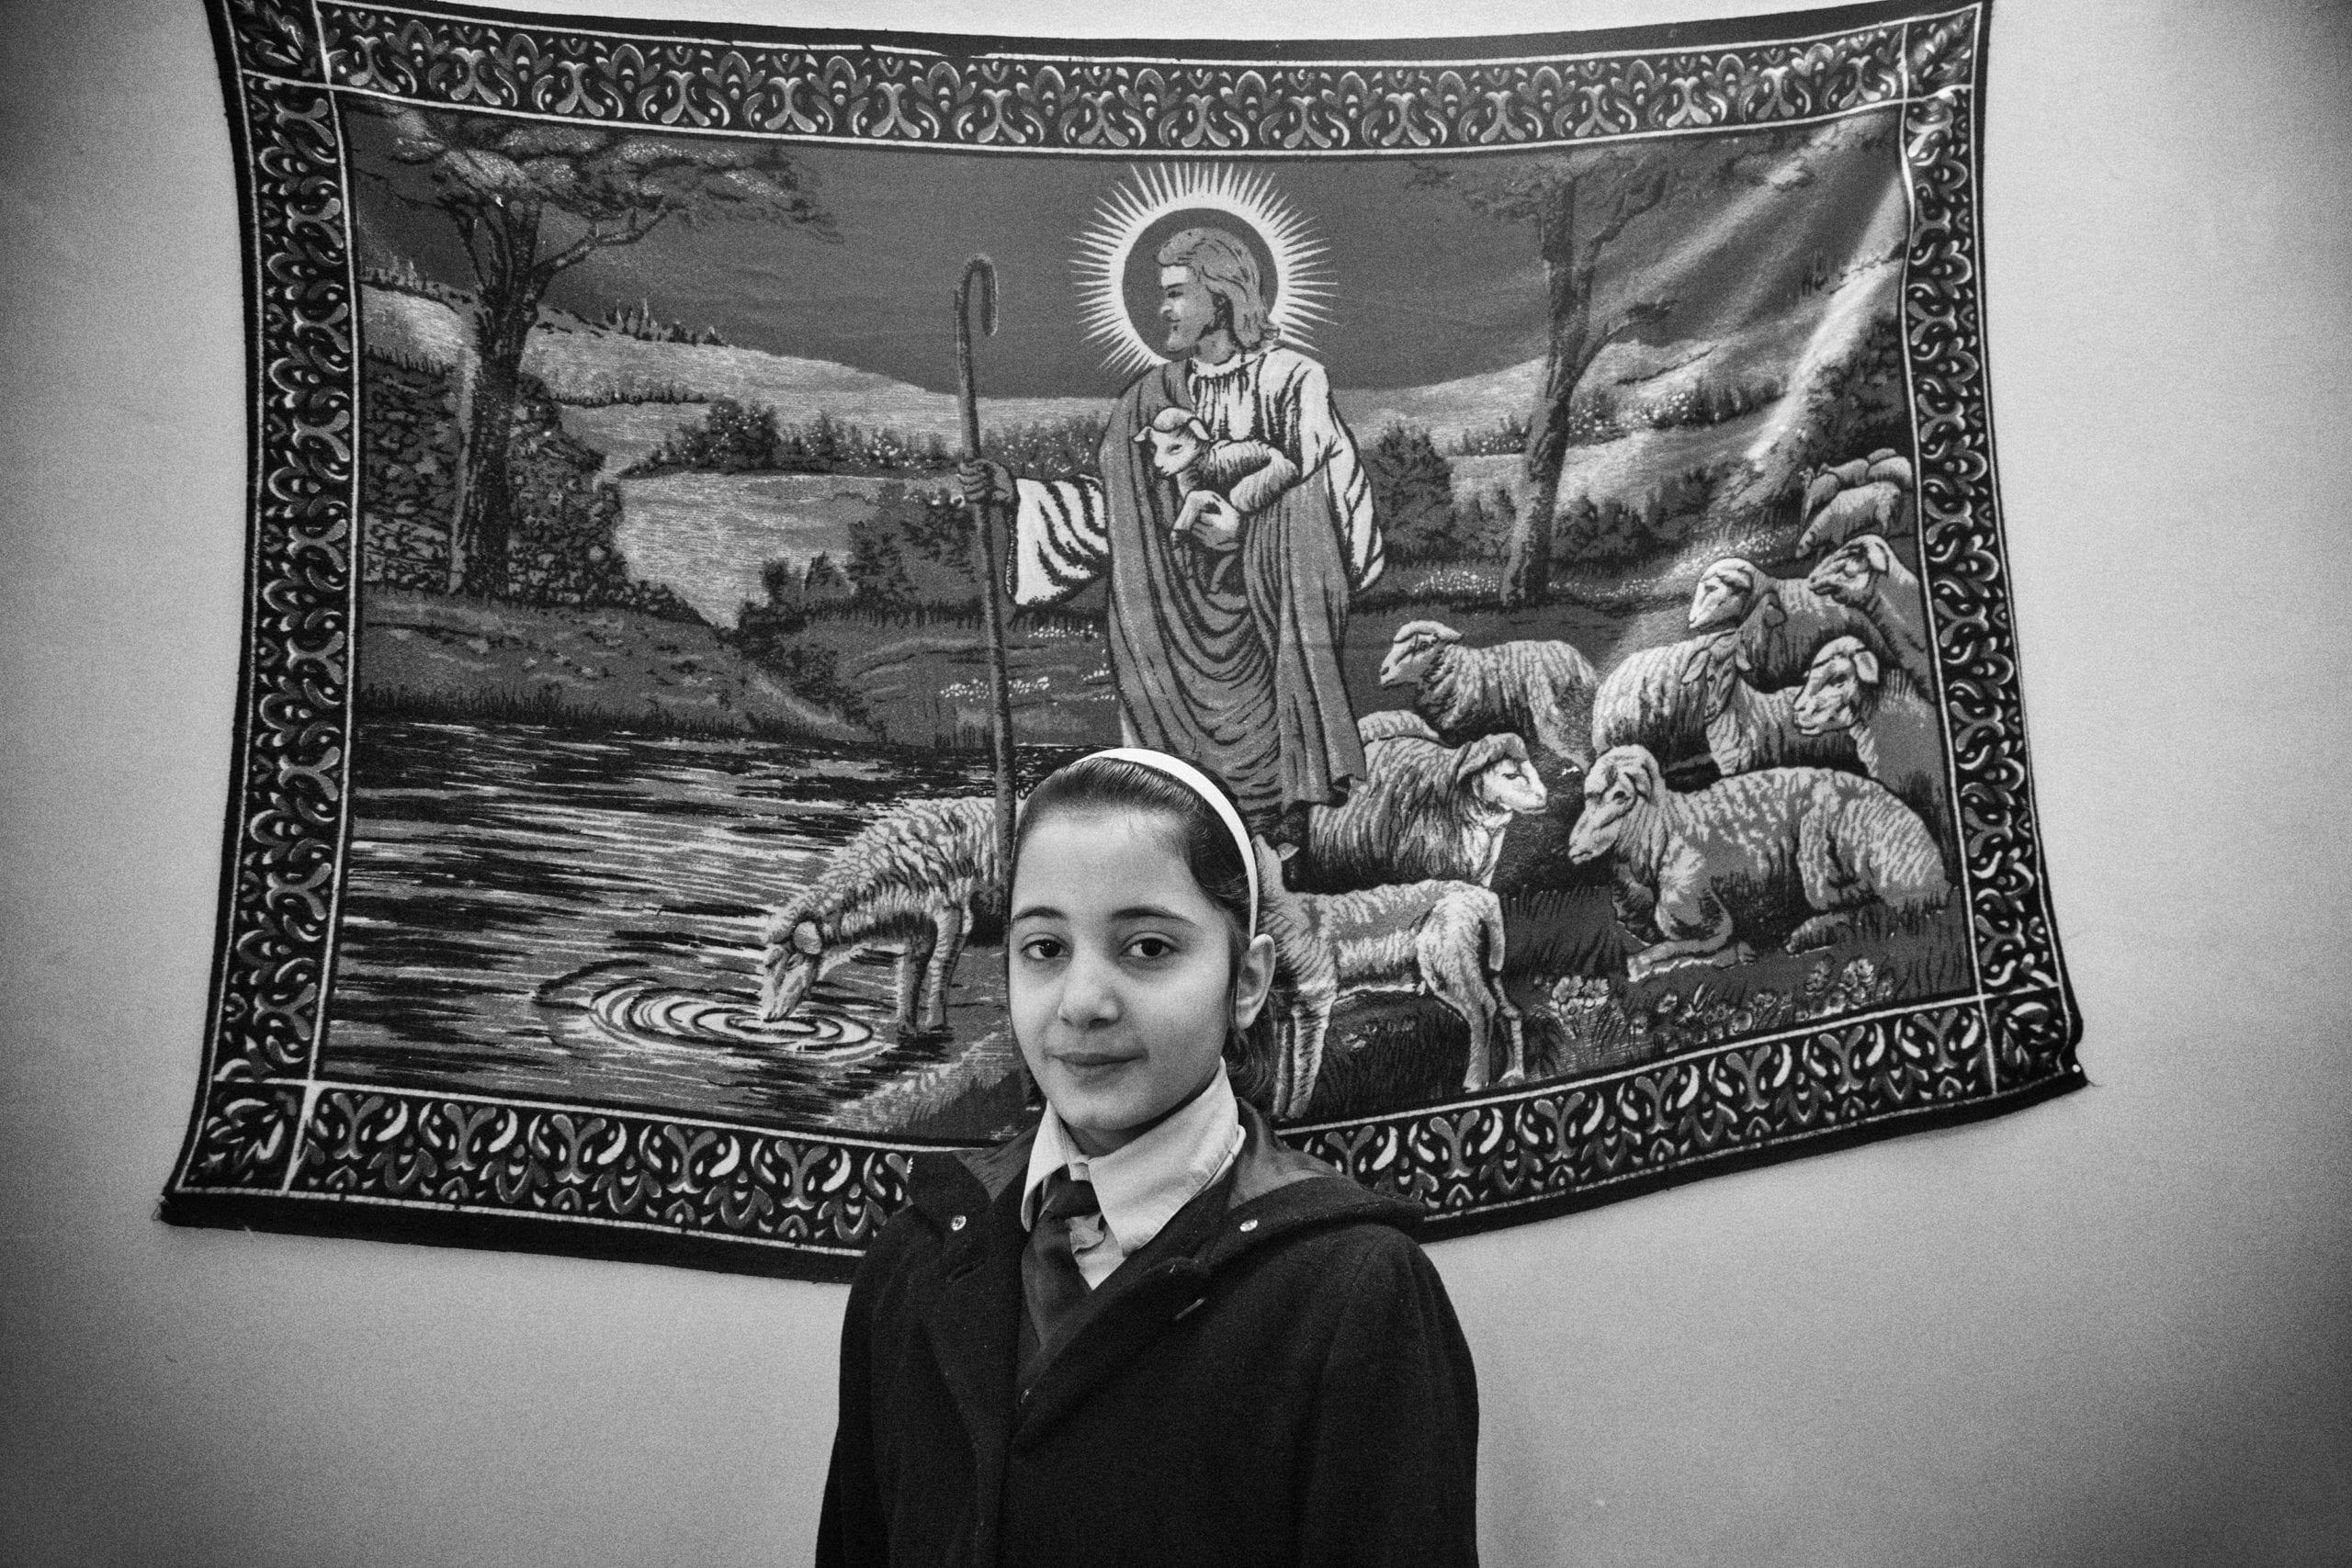 29.1.2015 Kirkuk , Iraq. Marta Ghanim, 11 years old, in her school dress. She studies at a Christian School in Kirkuk.